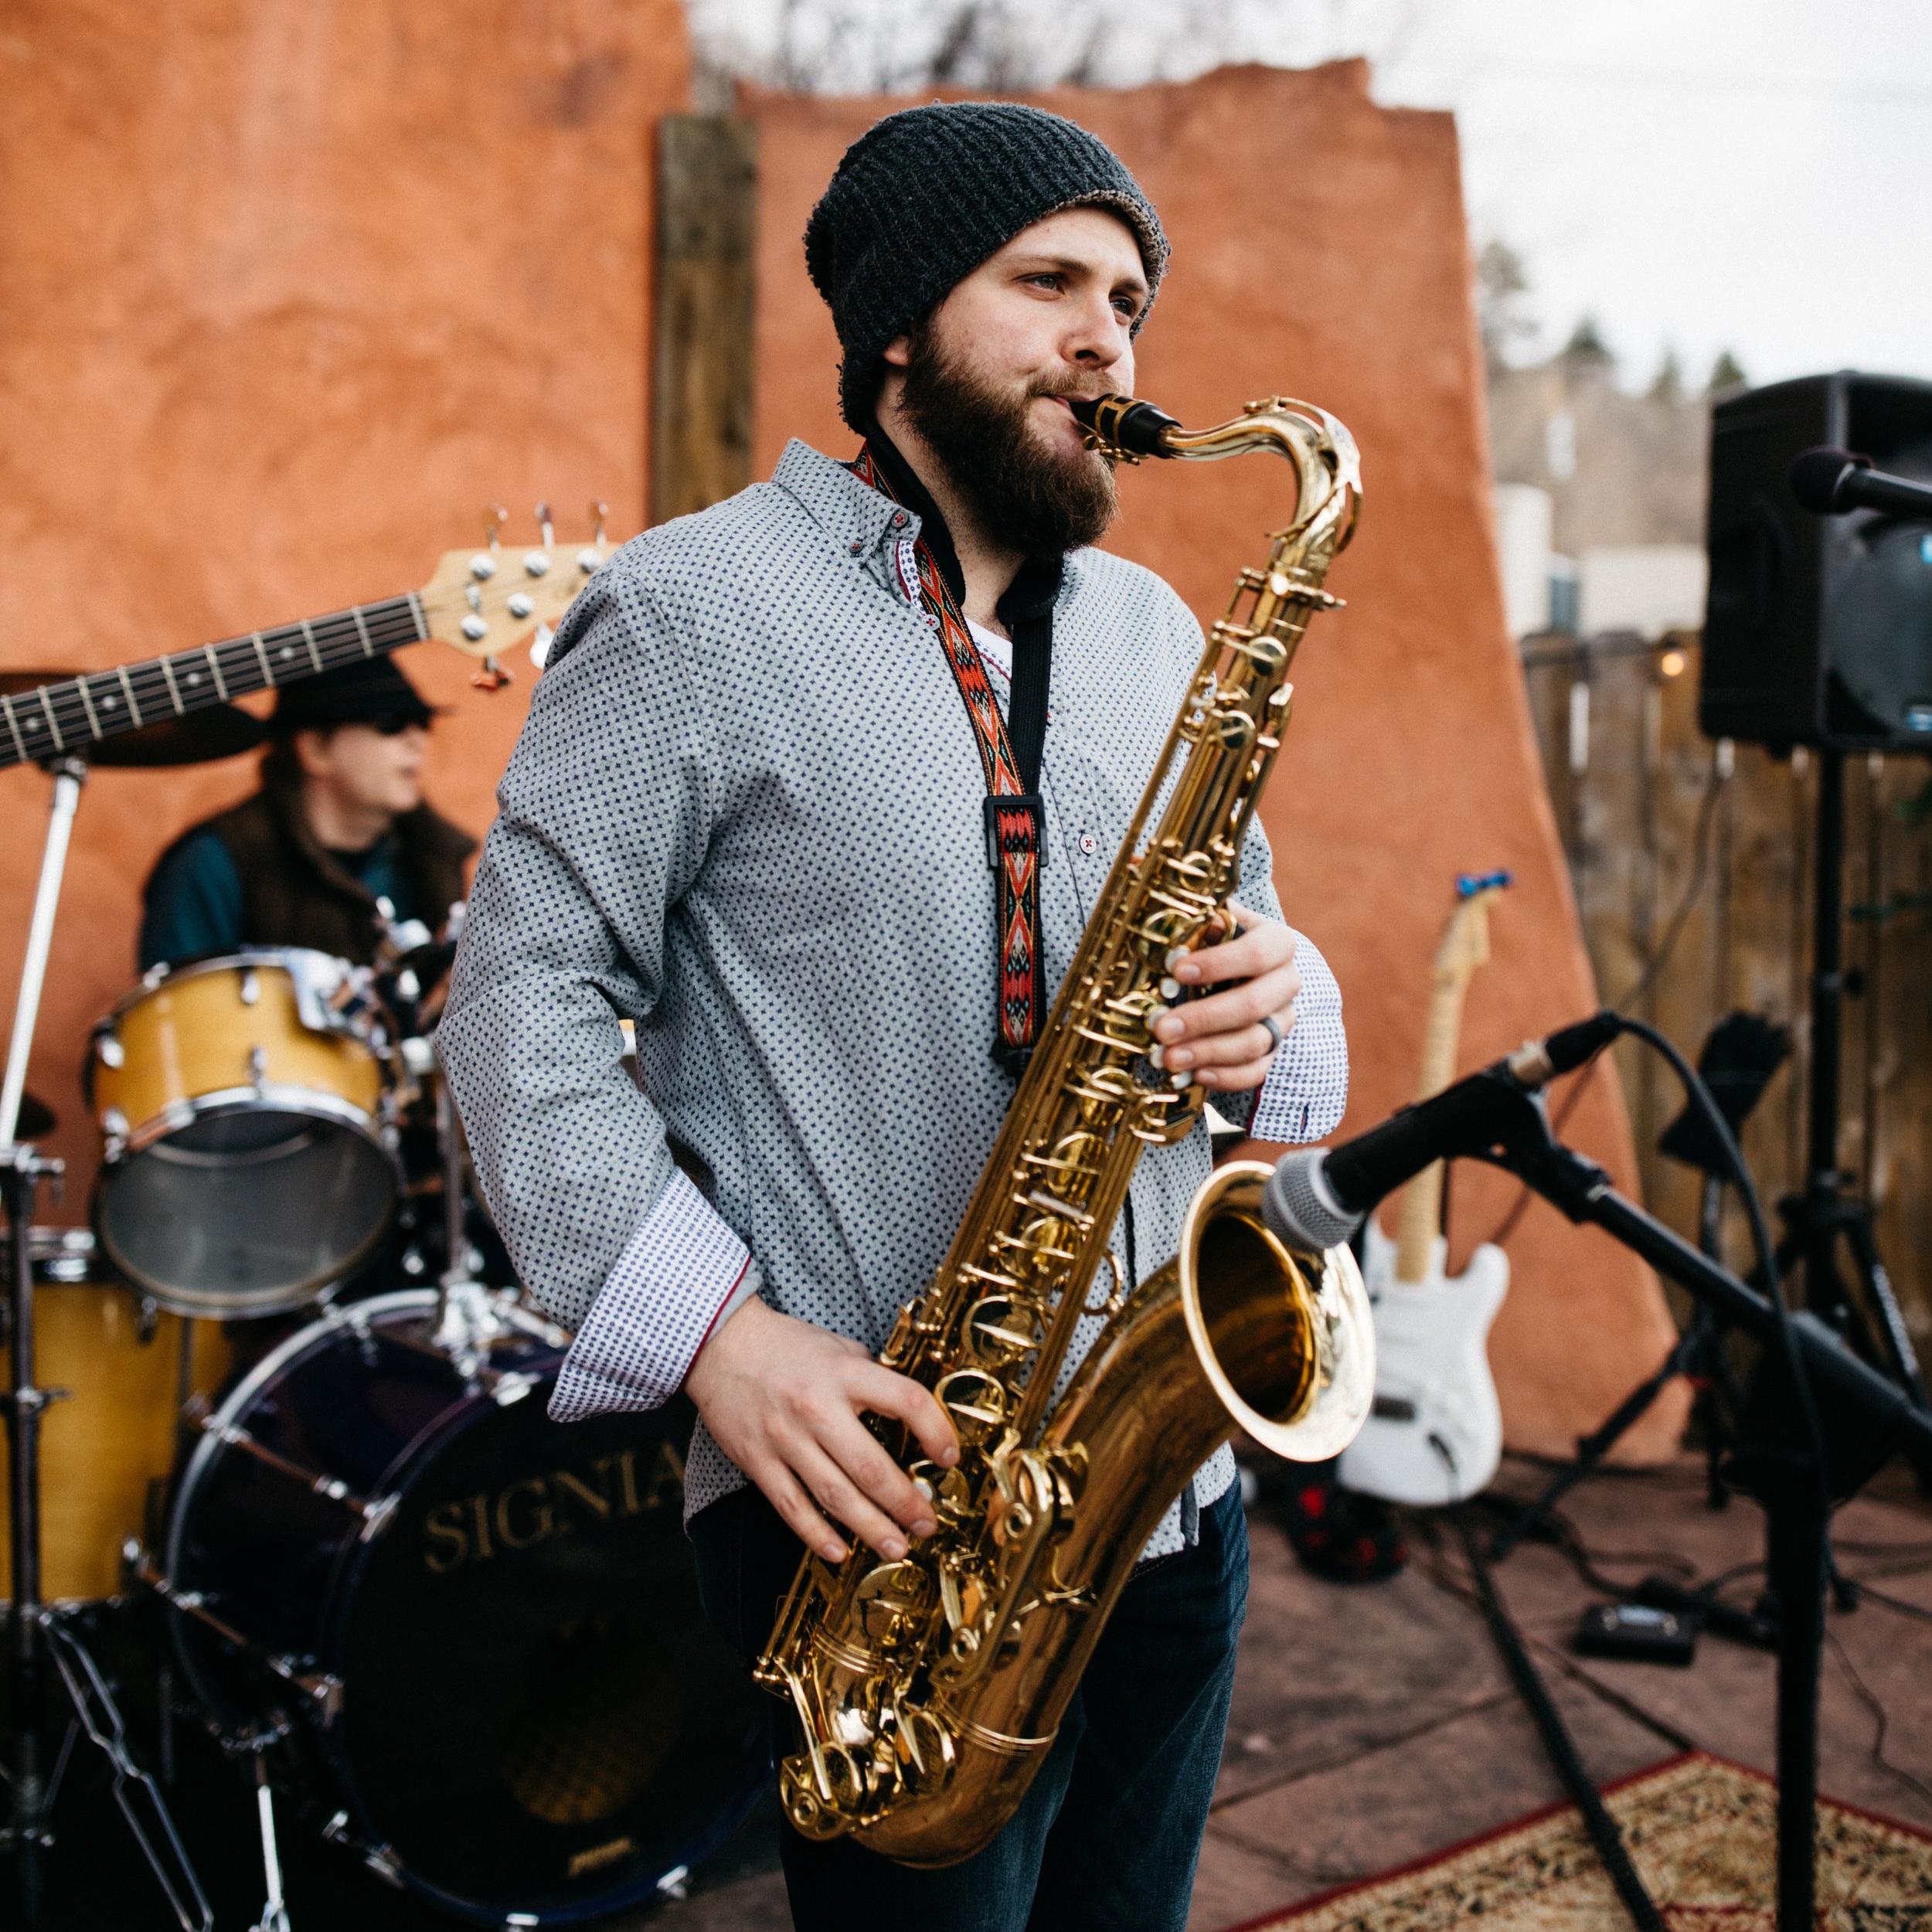 Michael George McCloskey - Saxophones & WebmasterPhoto by Sharee Davenport